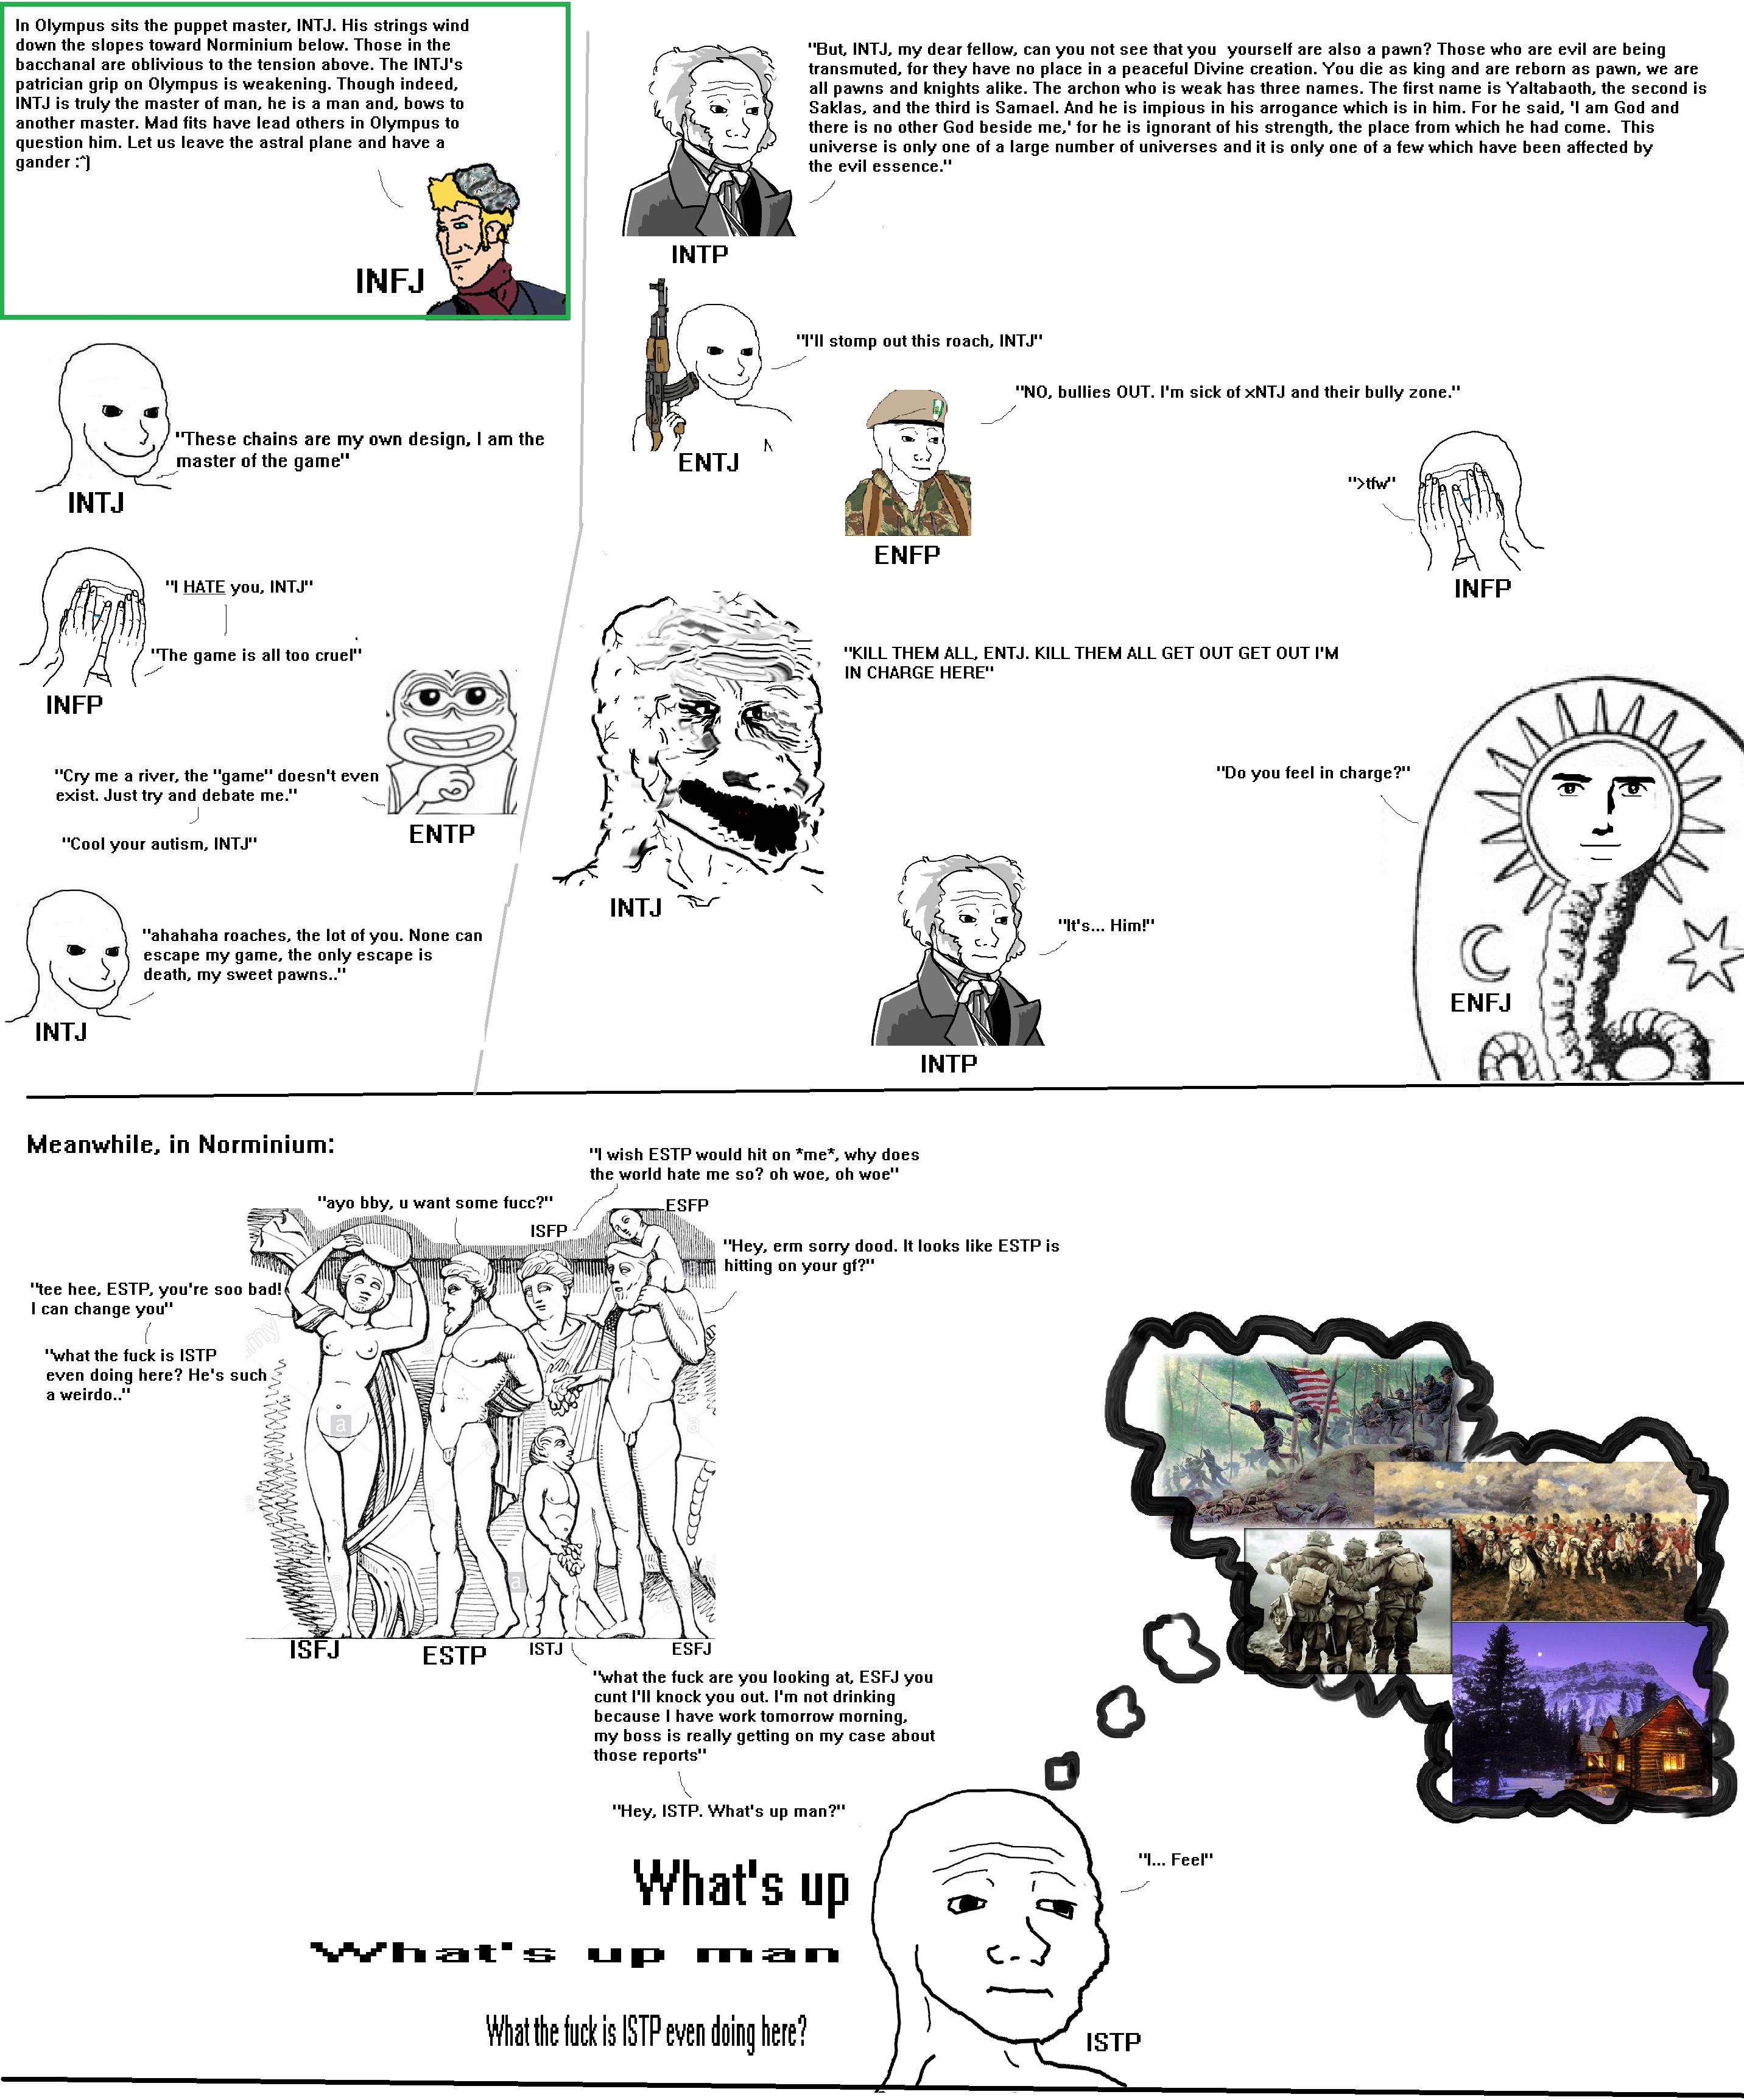 MBTI Gnosticism   Myers-Briggs Type Indicator (MBTI)   Know Your Meme